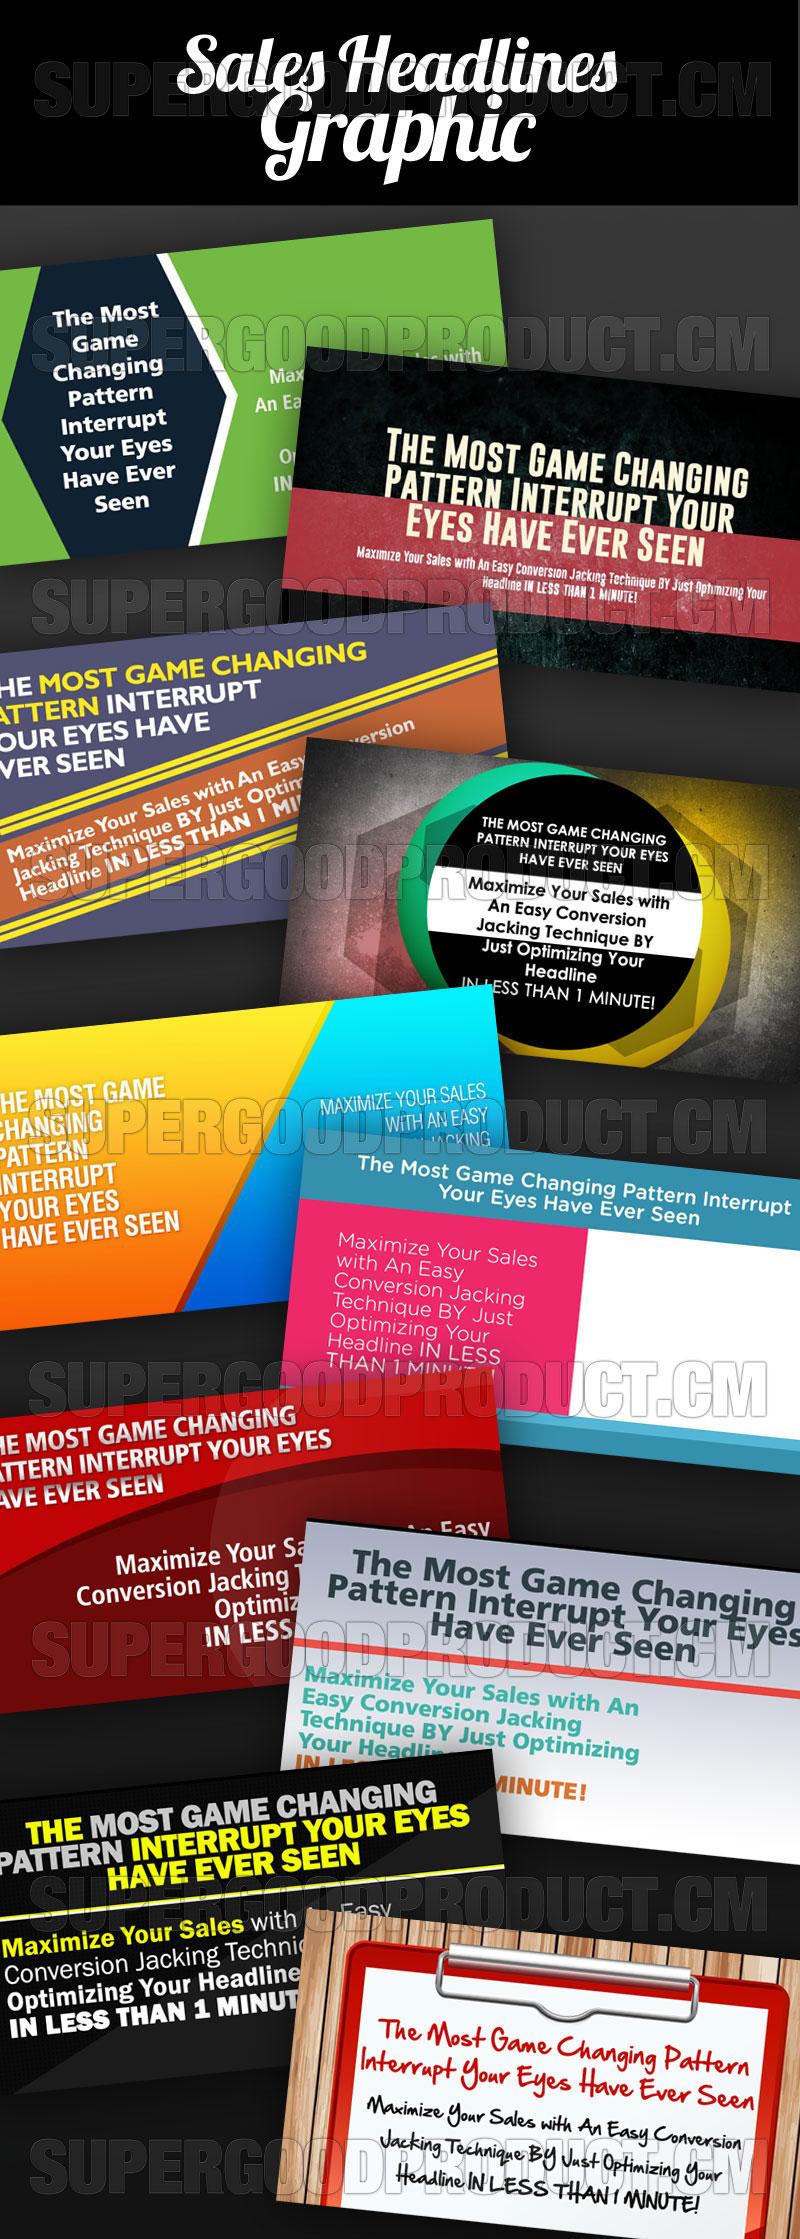 Sales-Headlines-Graphic-V2